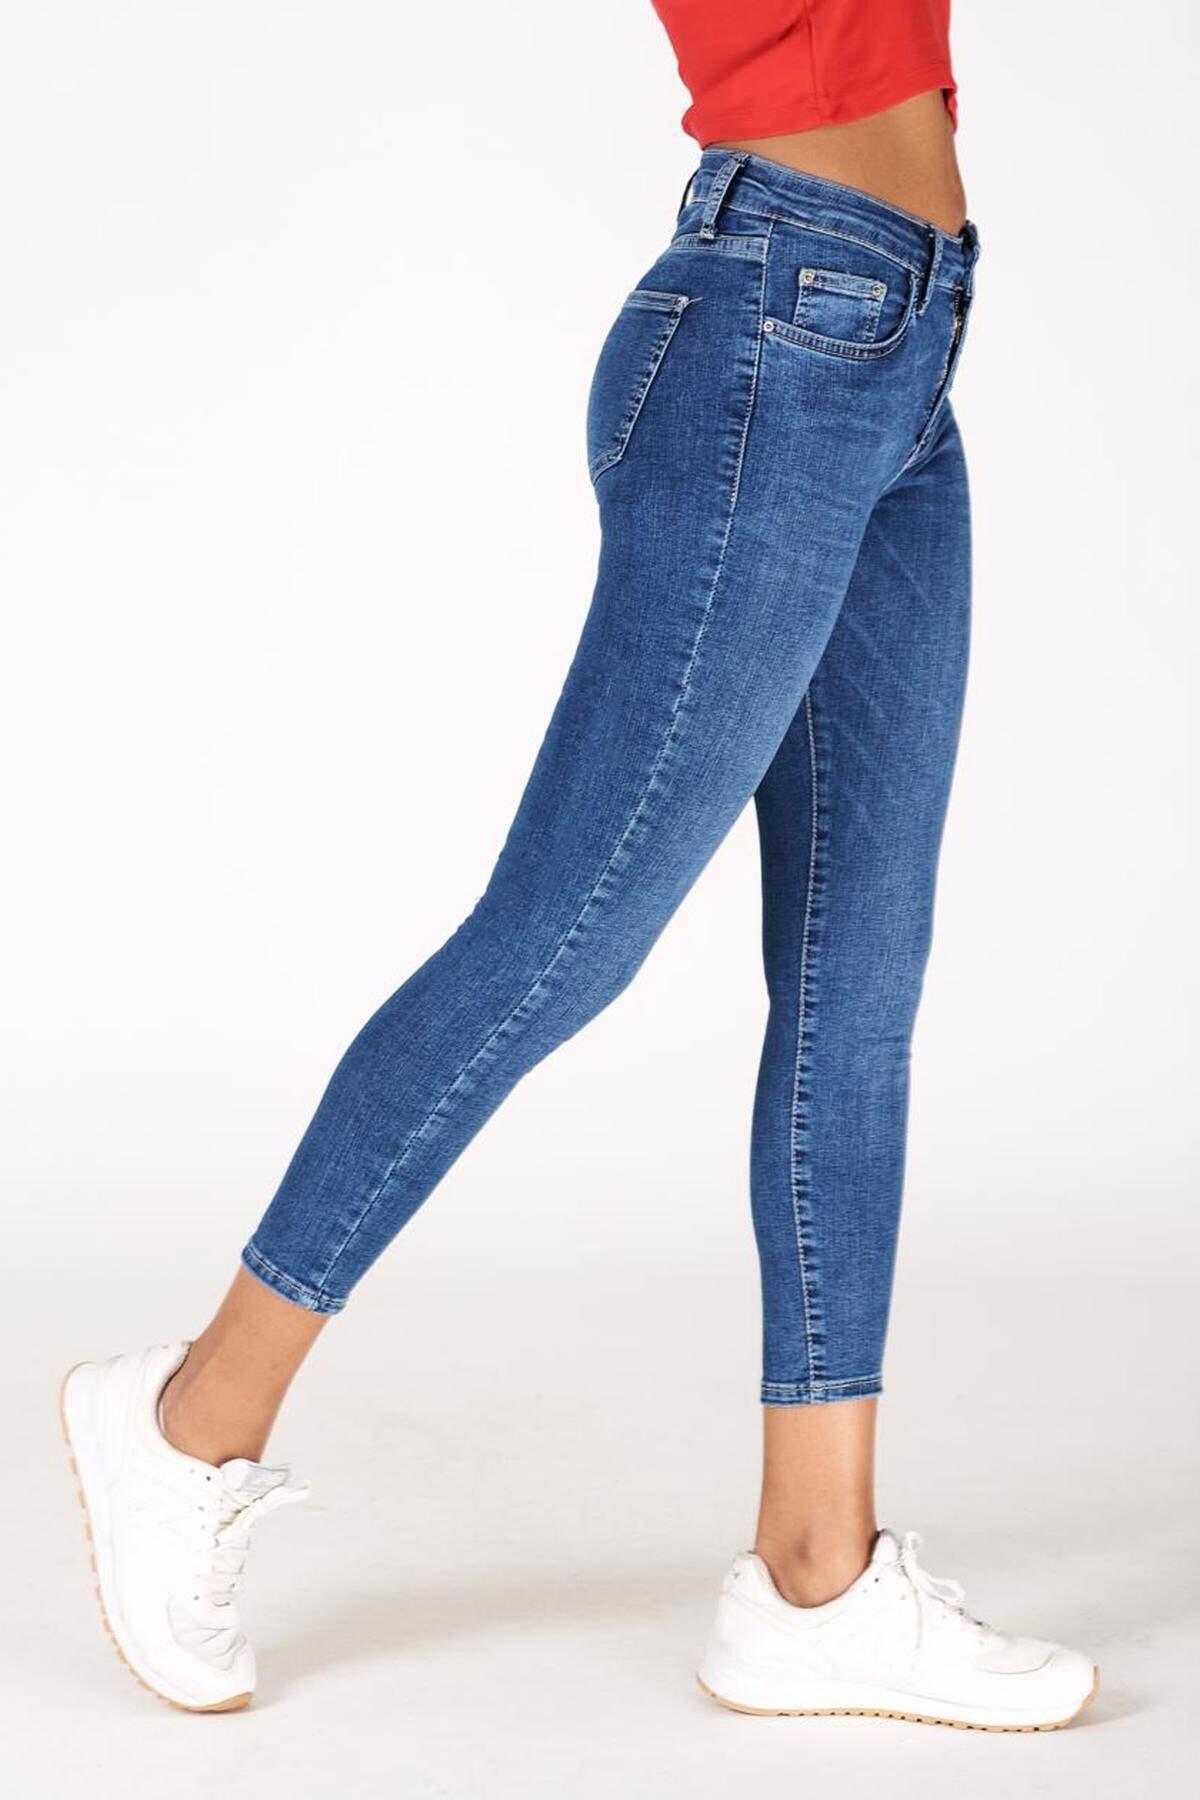 Addax Kadın Kot Rengi Orta Bel Pantolon Pn5799 - Pnr ADX-0000016979 1